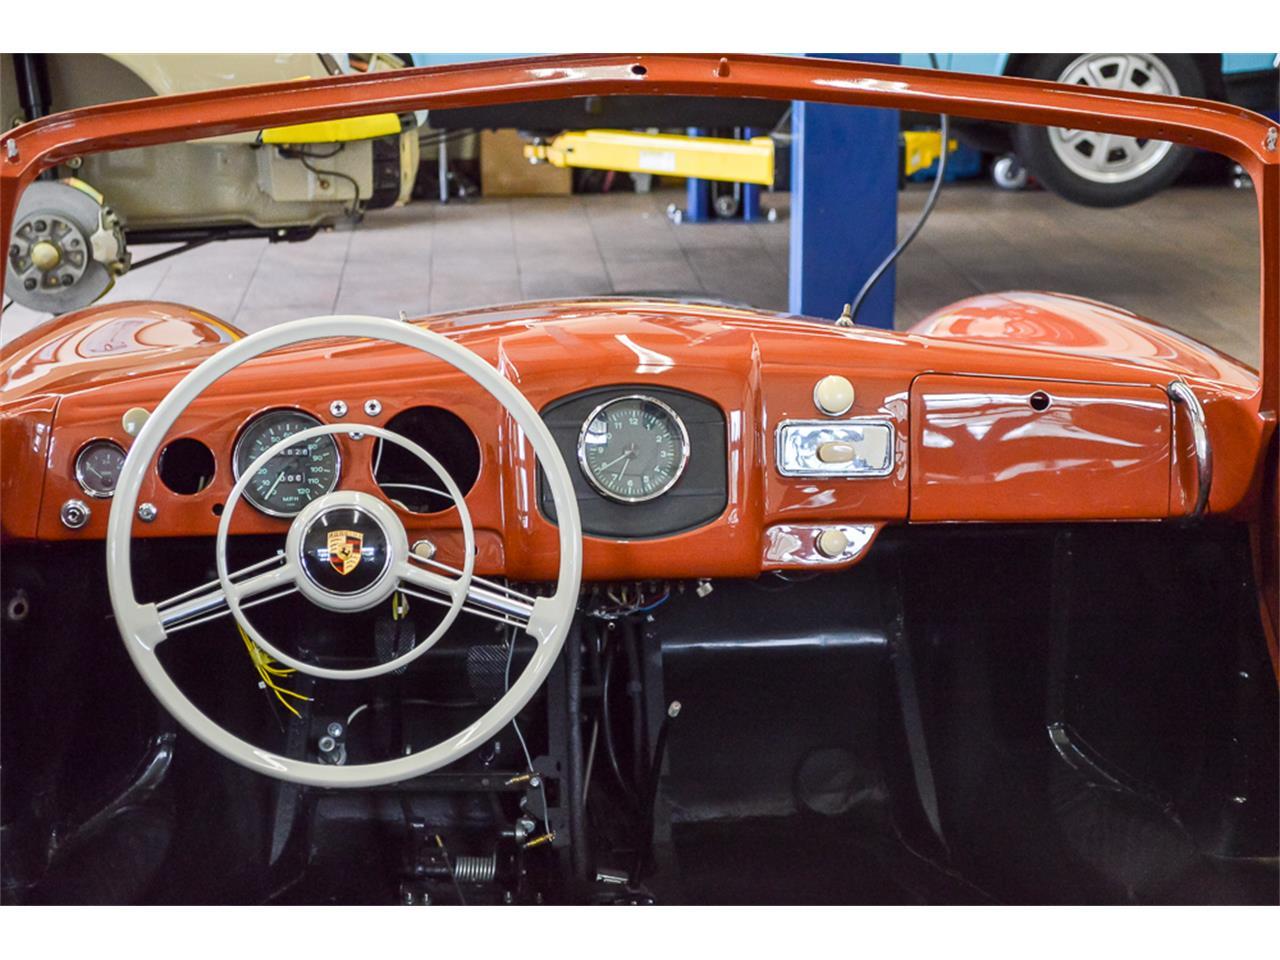 1955 Porsche 356 Continental Cabriolet (CC-1215311) for sale in Fallbrook, California